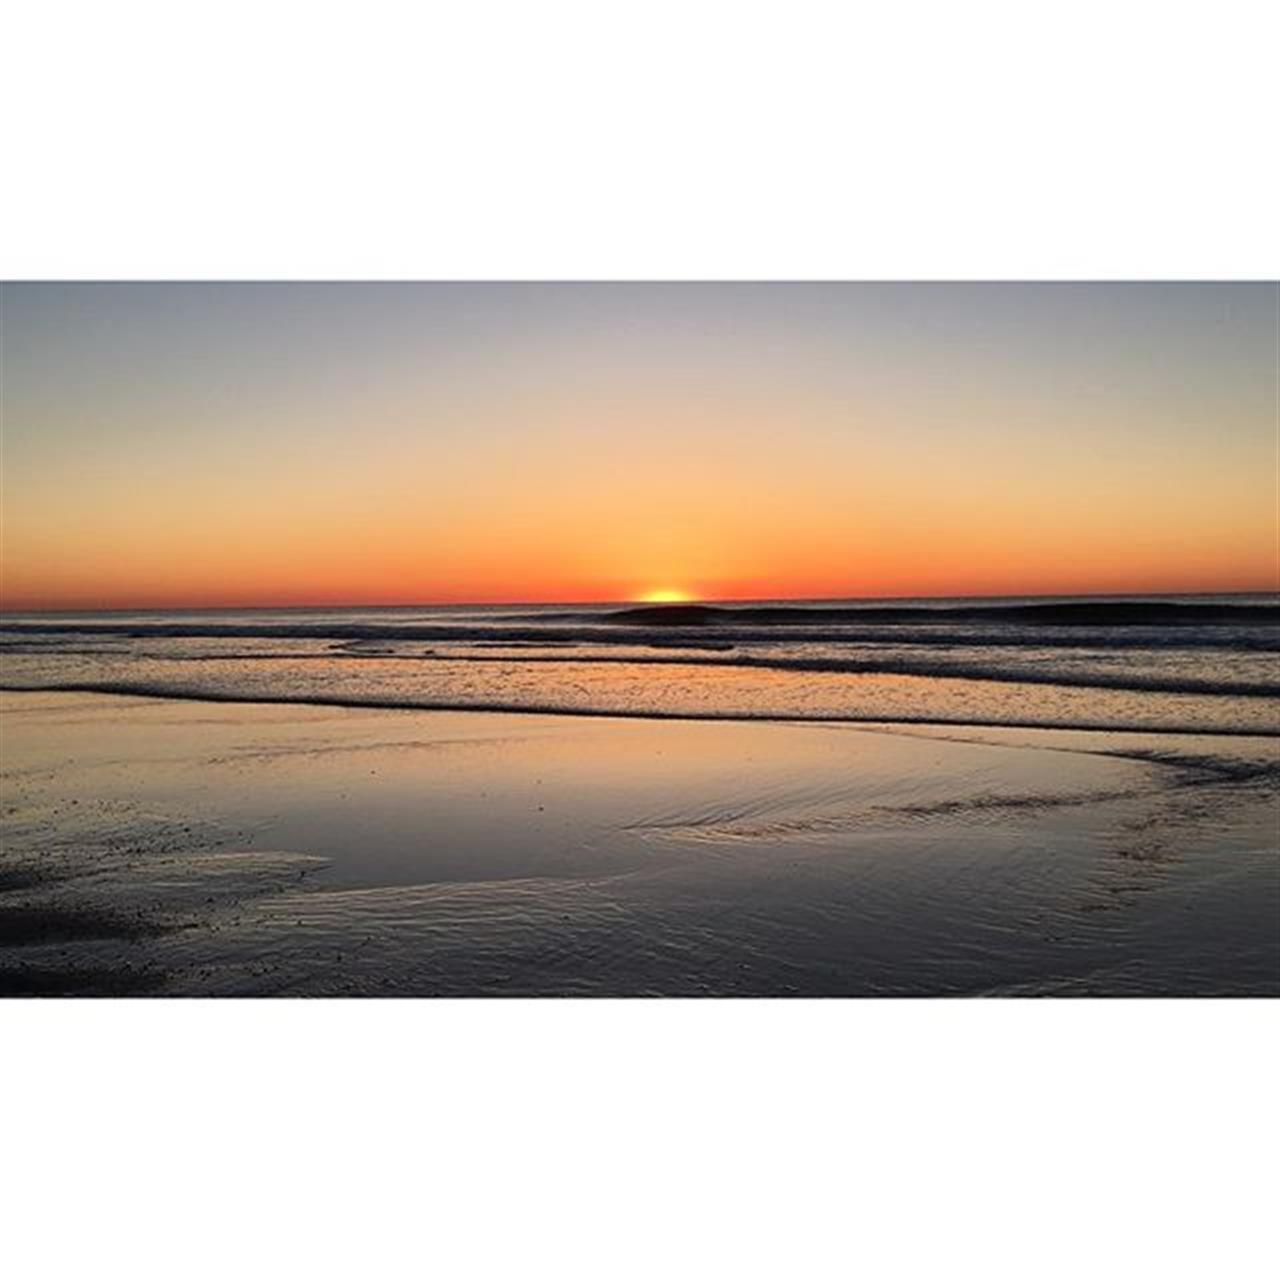 Just before sunrise in Mantoloking... #mantoloking #nj #sunrise #goodmorning #jshn